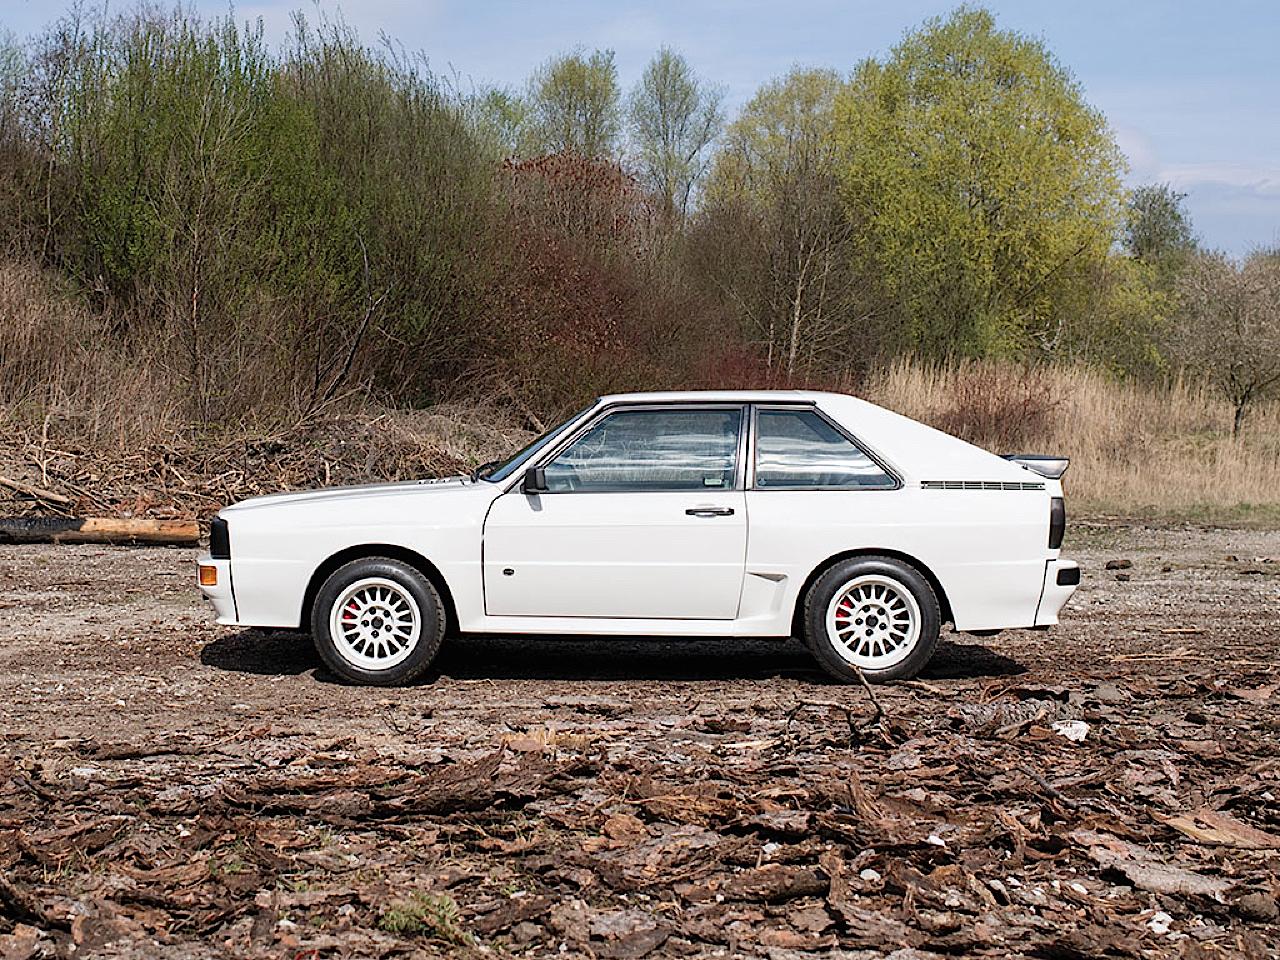 Audi Quattro Sport - Châssis court, turbo et muscu ! 28